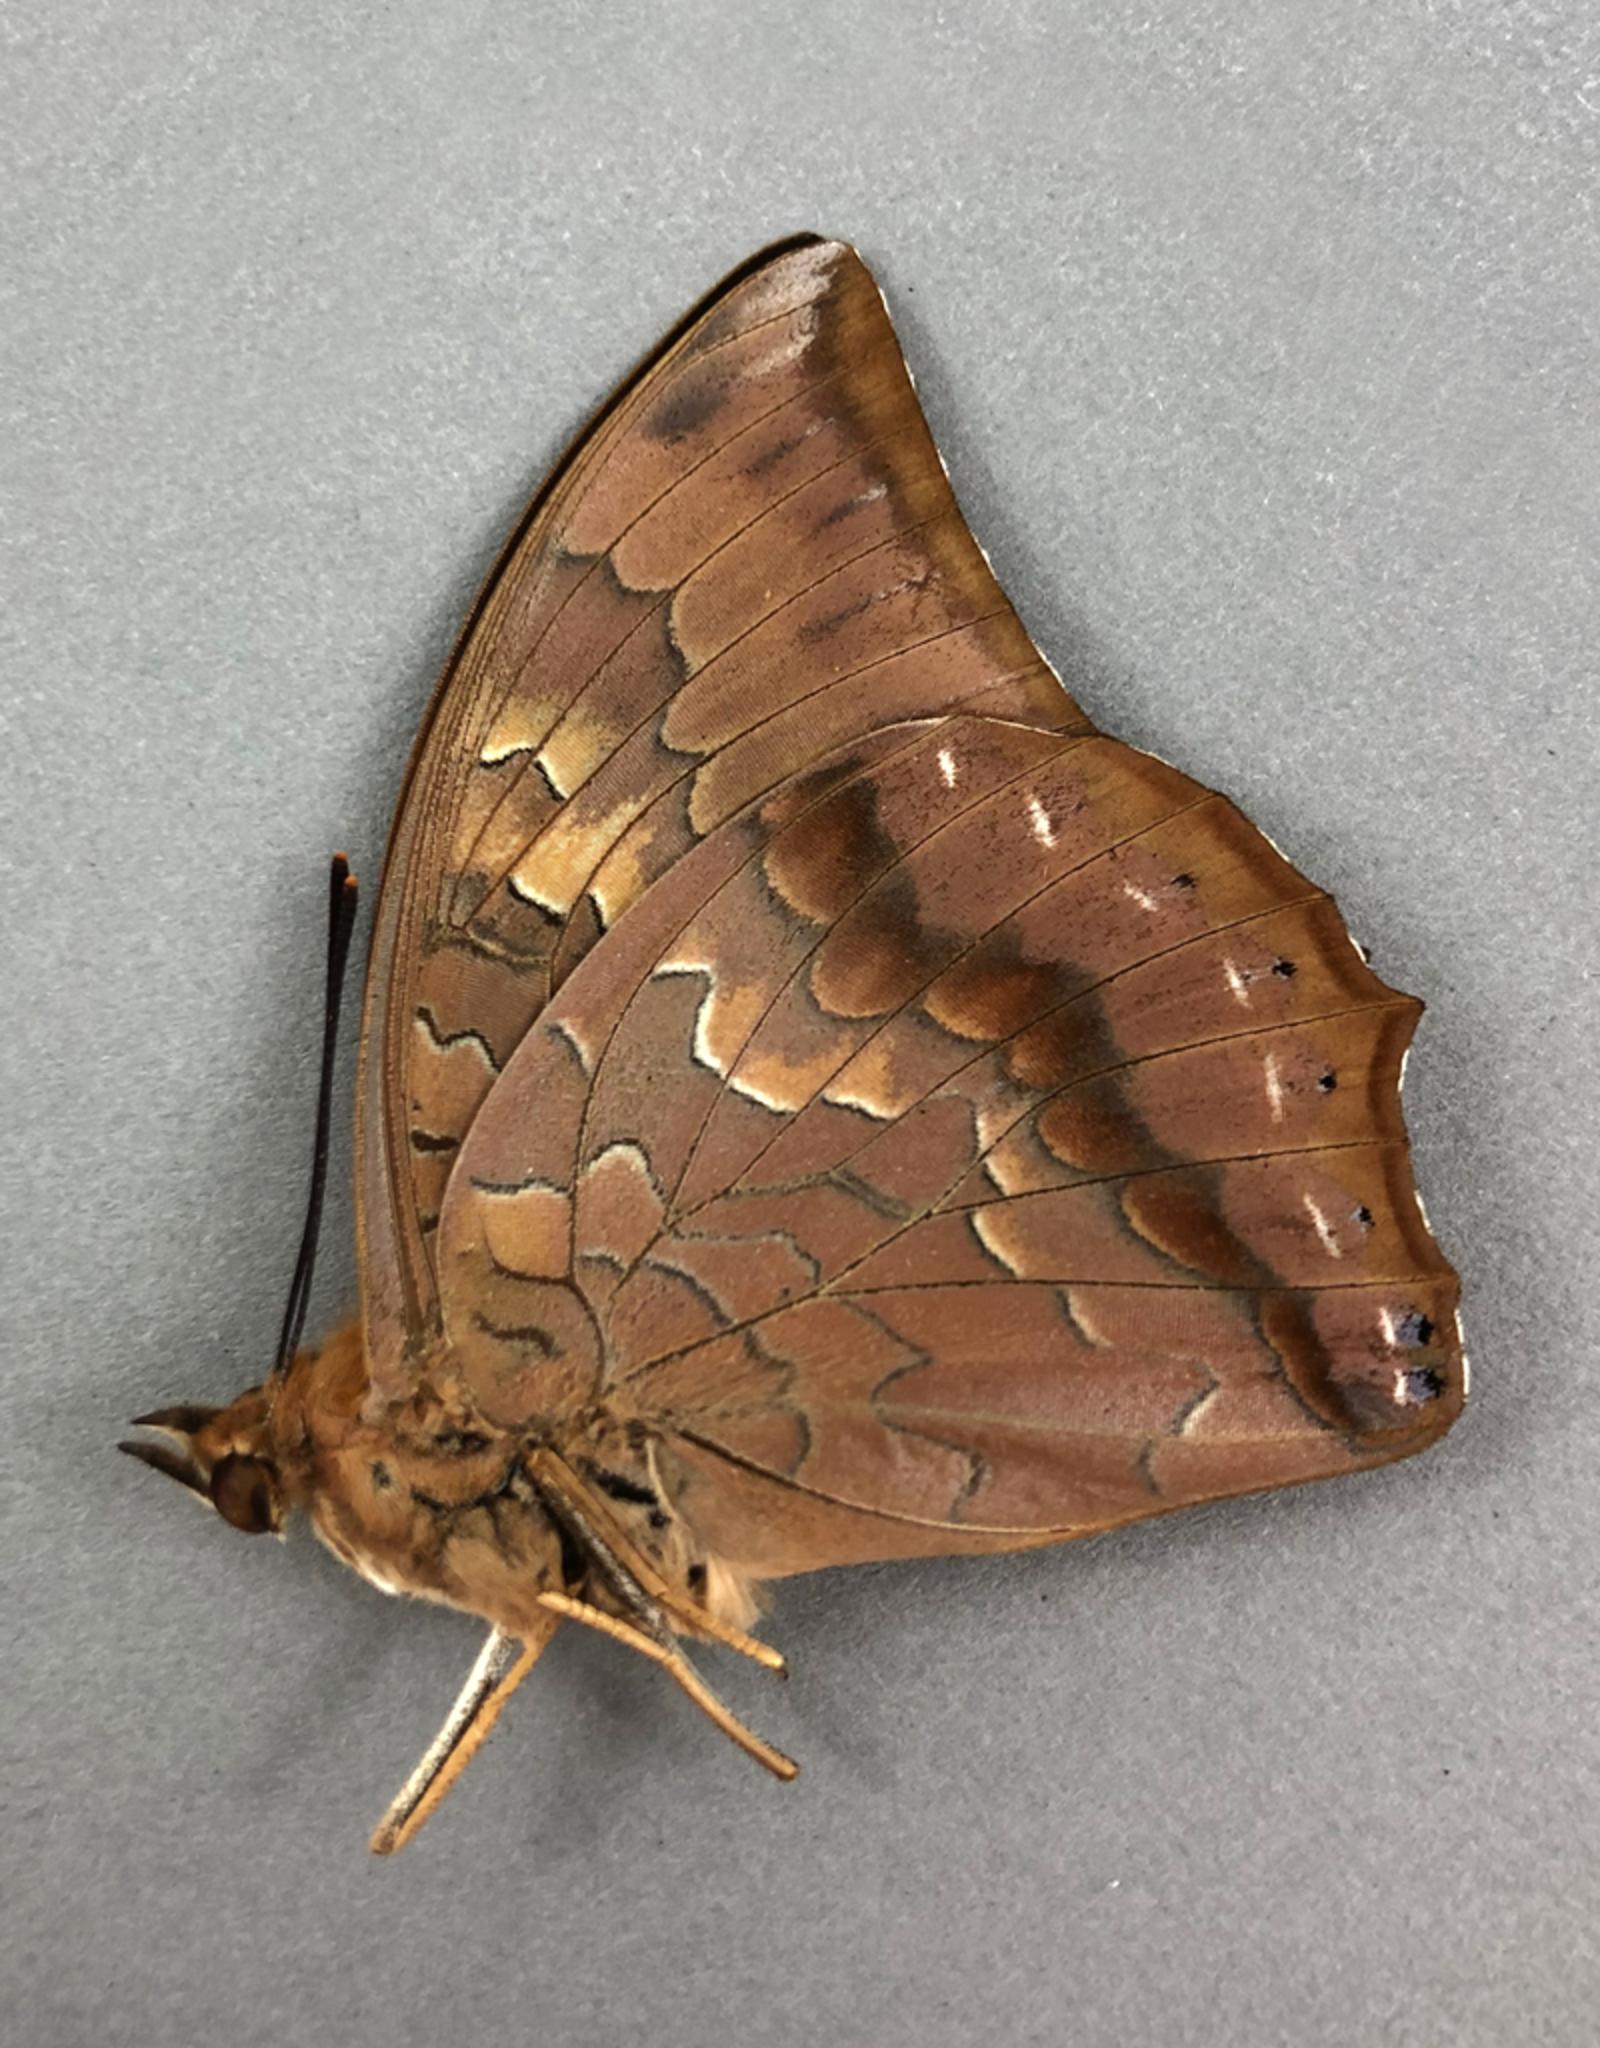 Charaxes bernardus f. hipponax M A1 Thailand